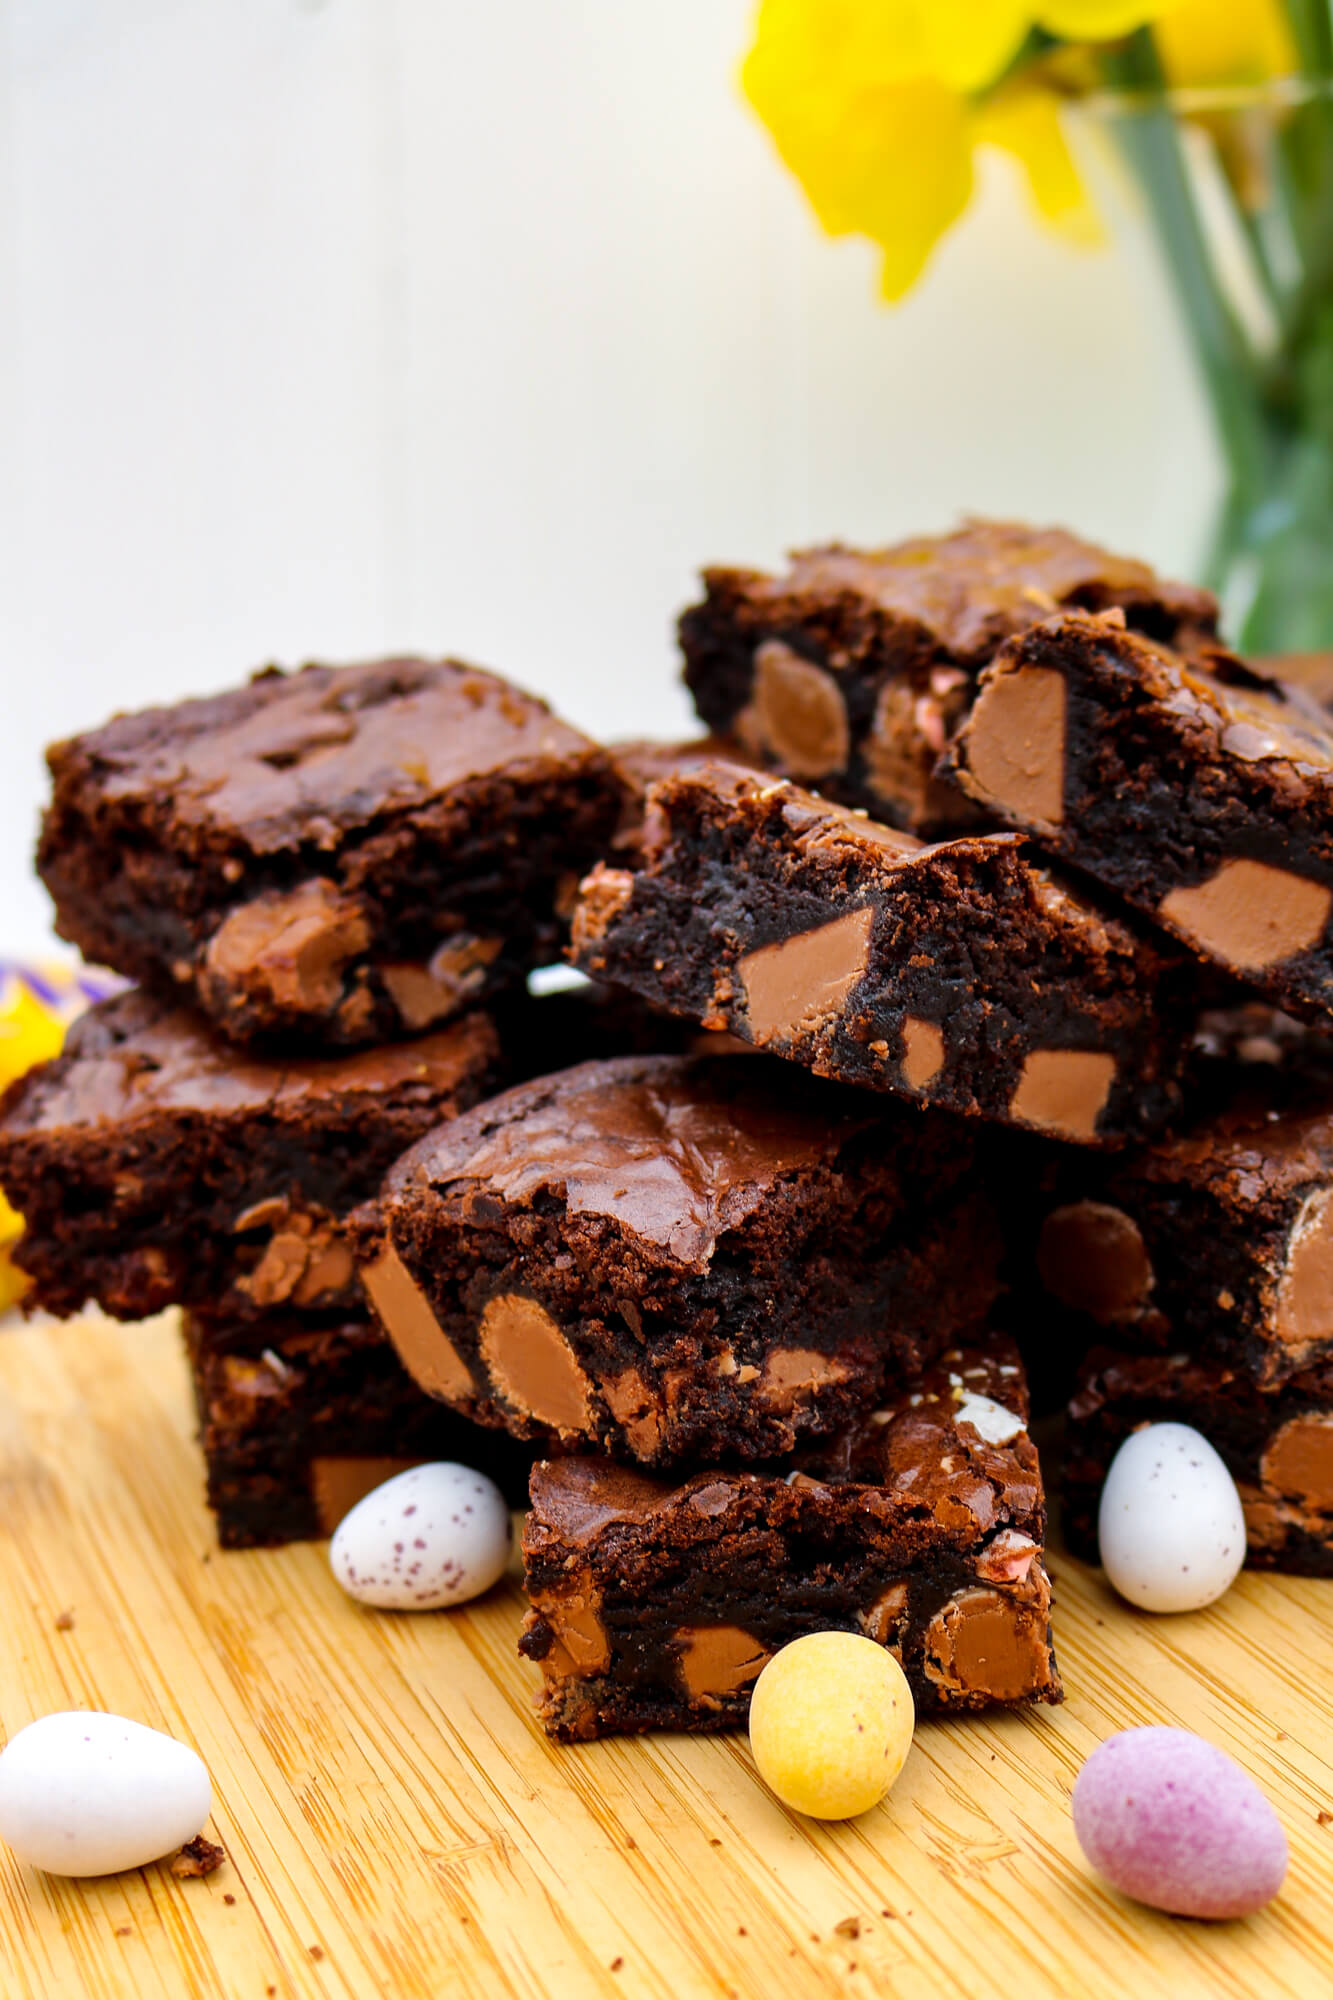 Mini Egg Gluten Free Brownies | Take Some Whisks